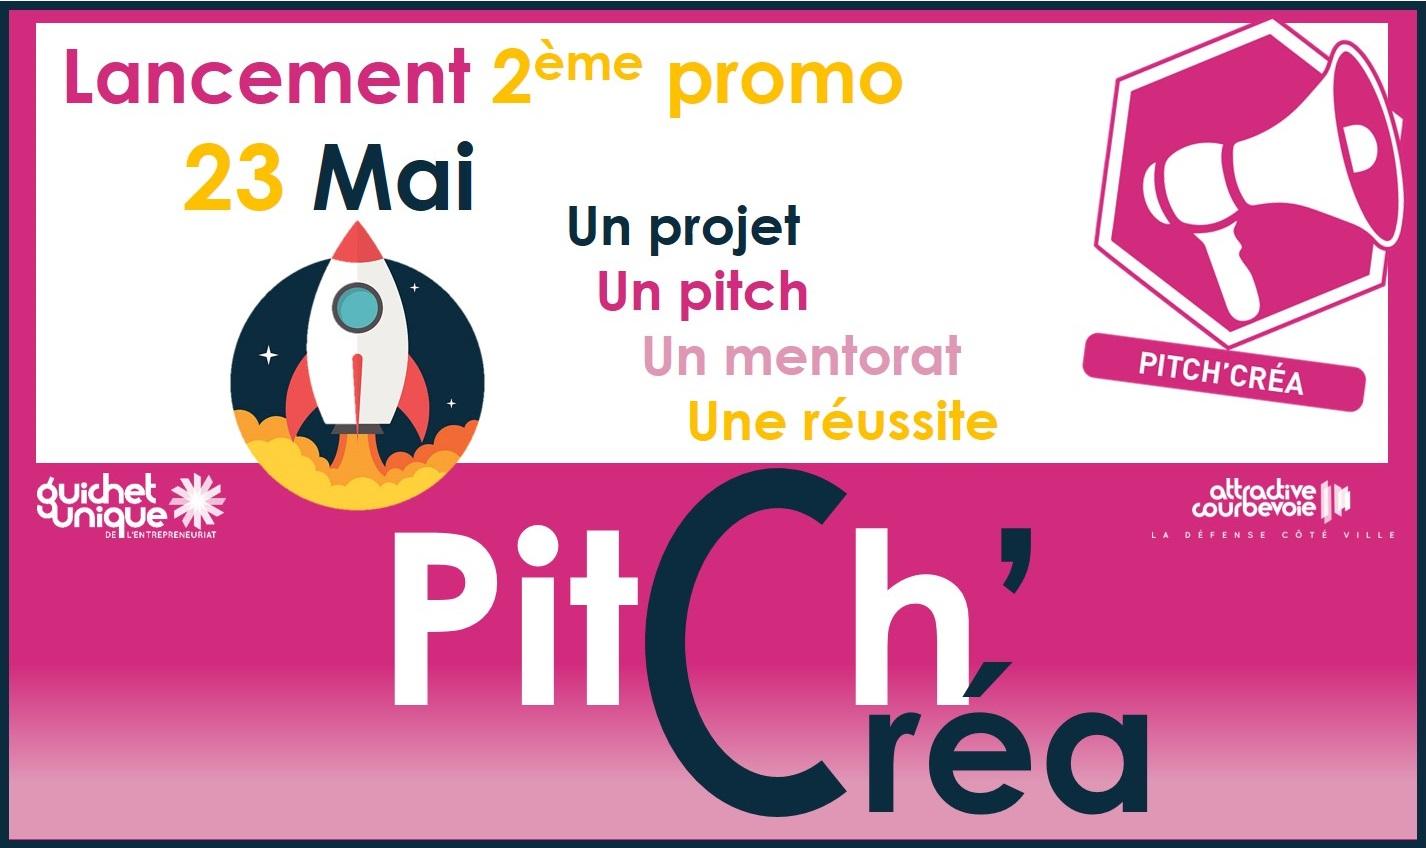 Pitch-Créa-Courbevoie